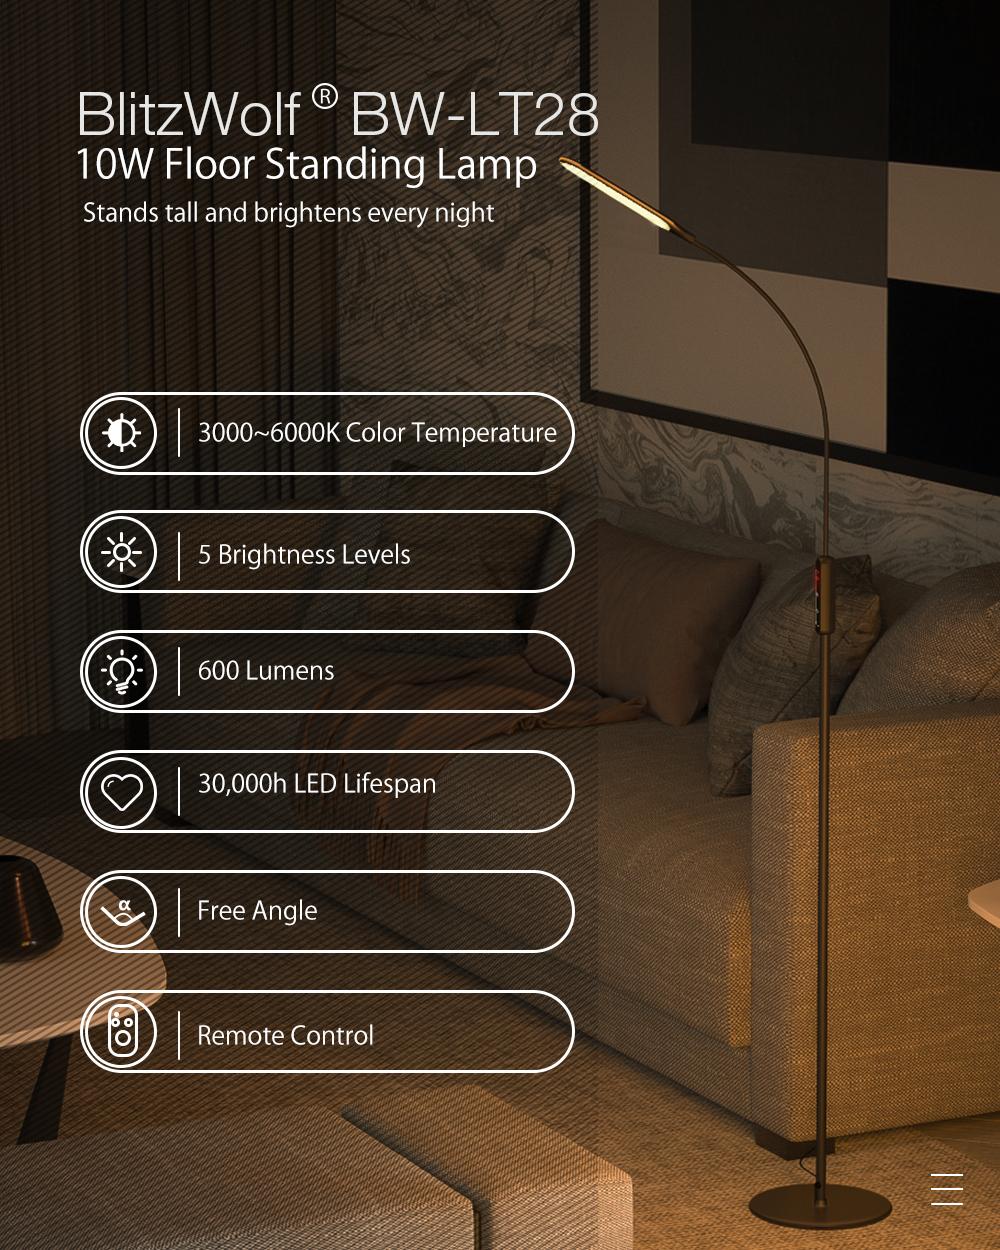 Blitzwolf BW-L28 stand lamp